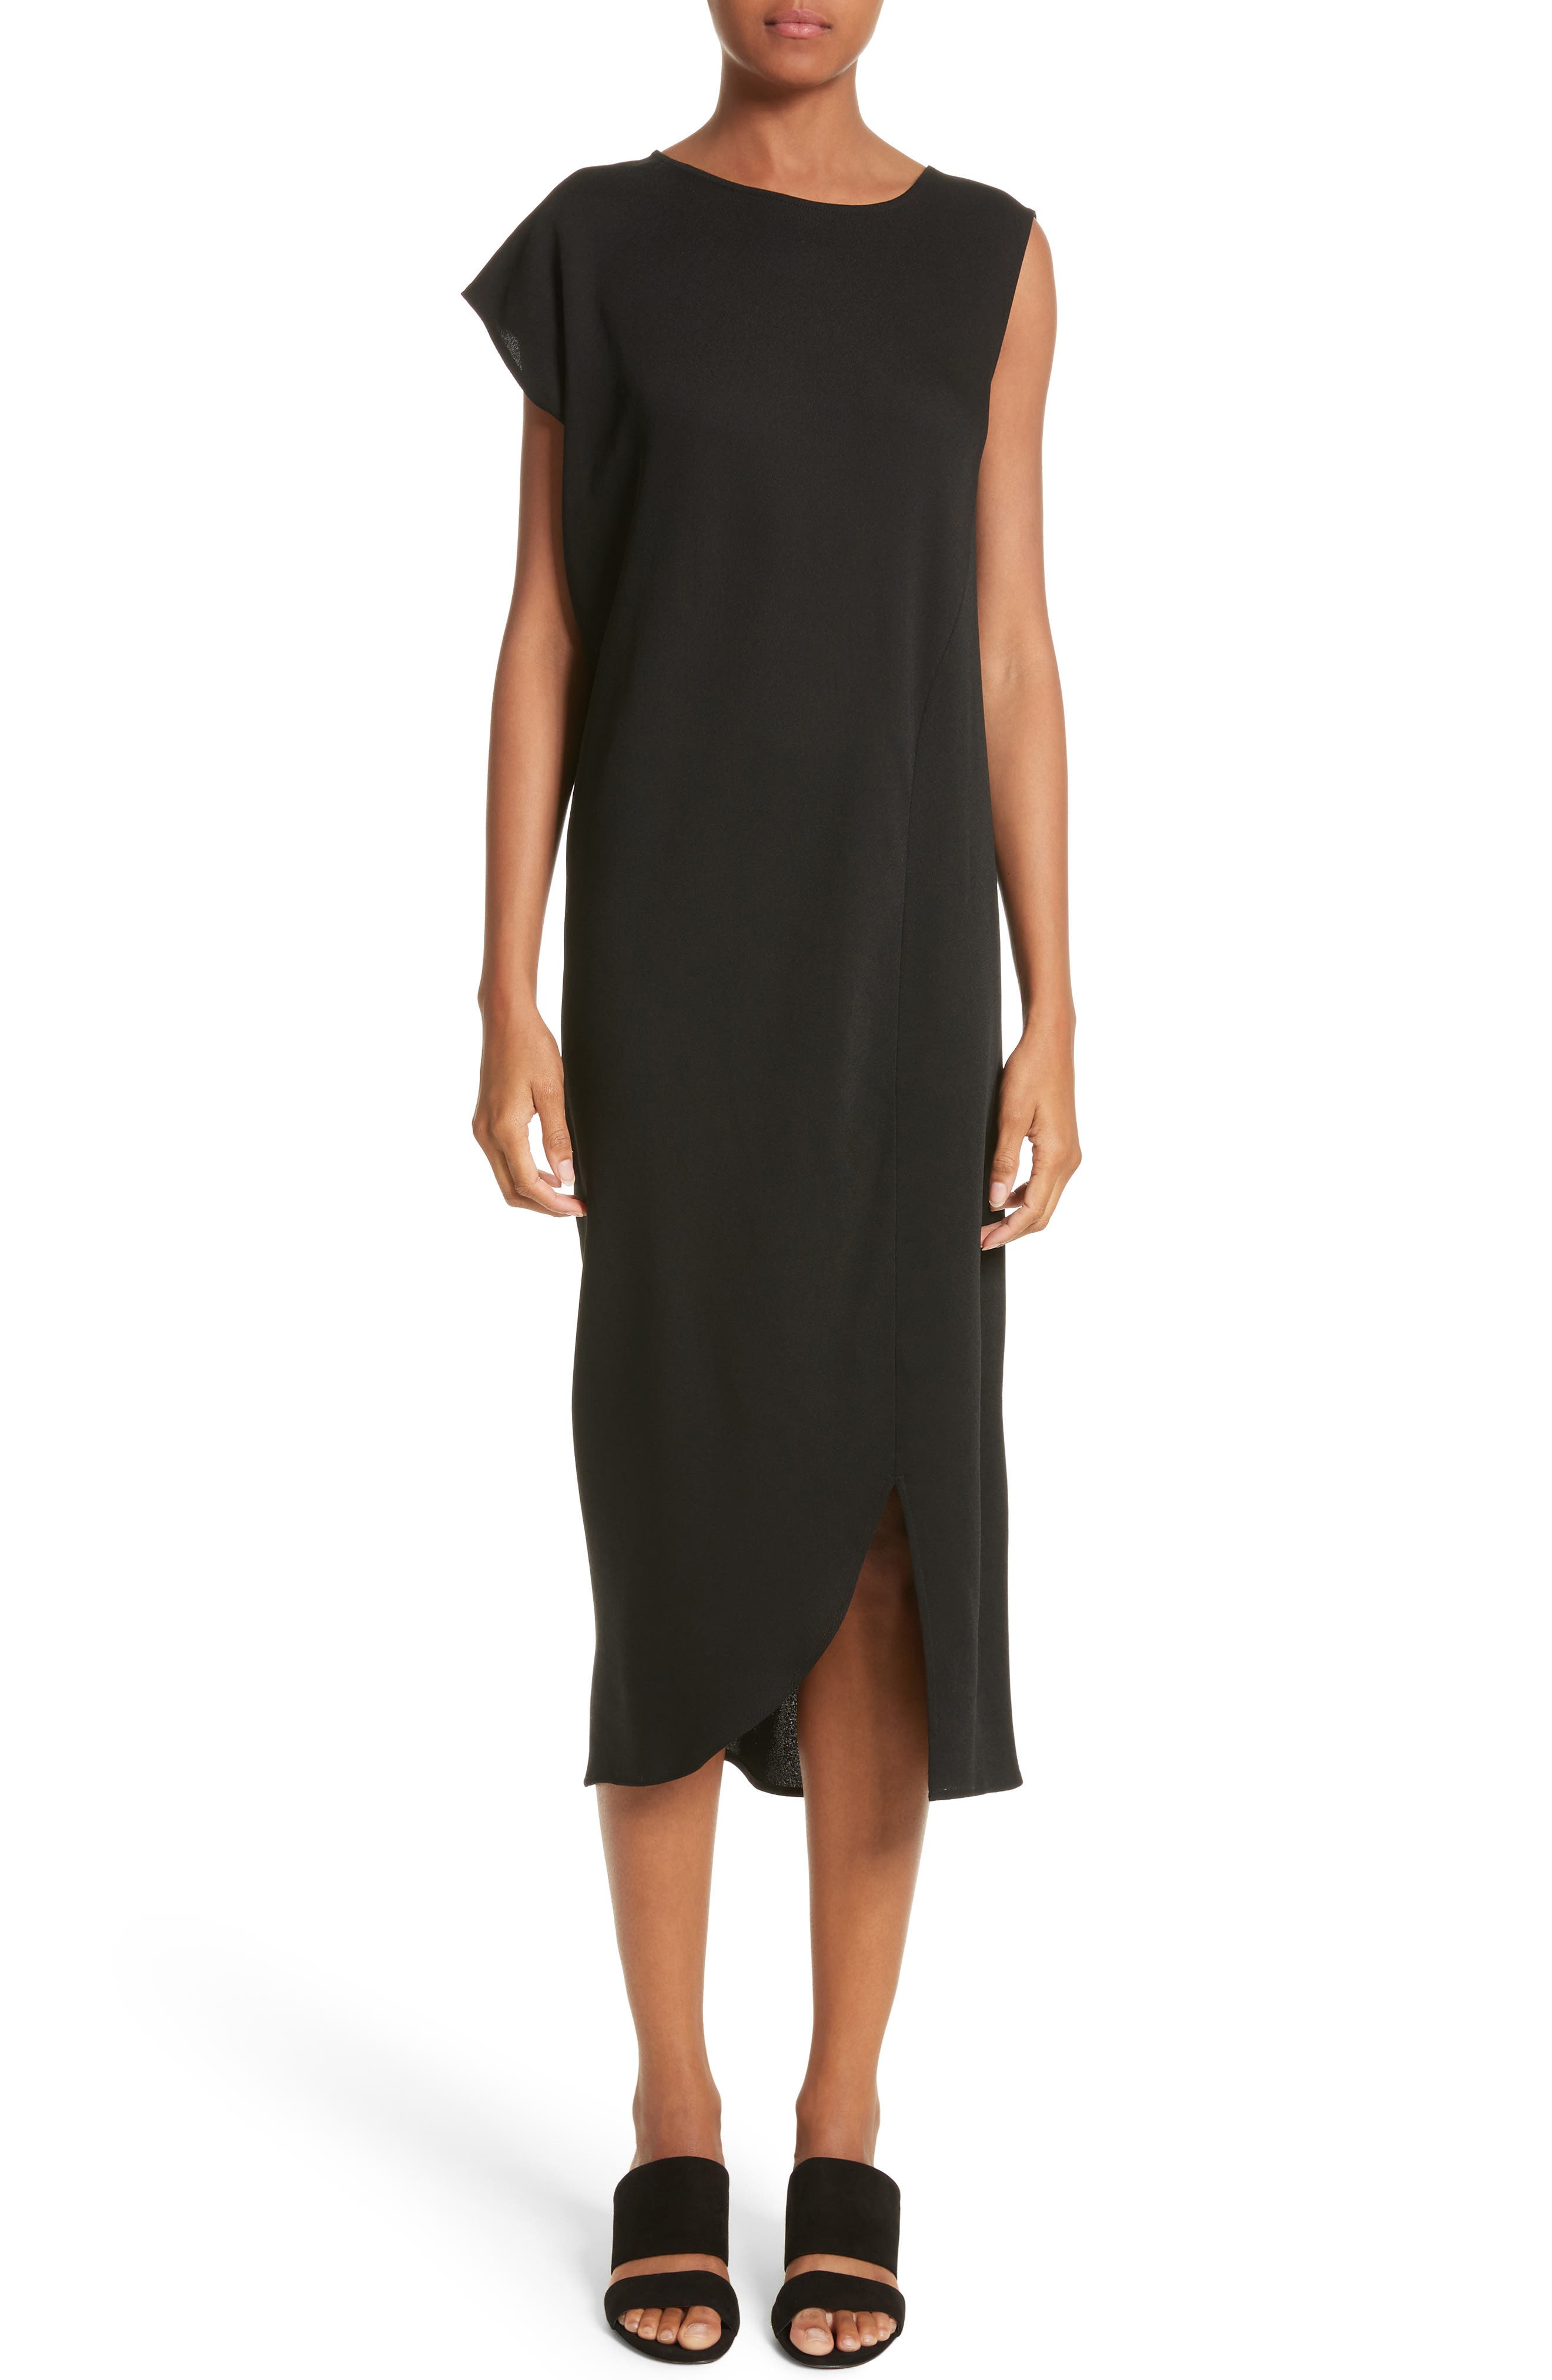 Tula Eco Drape Dress,                             Main thumbnail 1, color,                             001